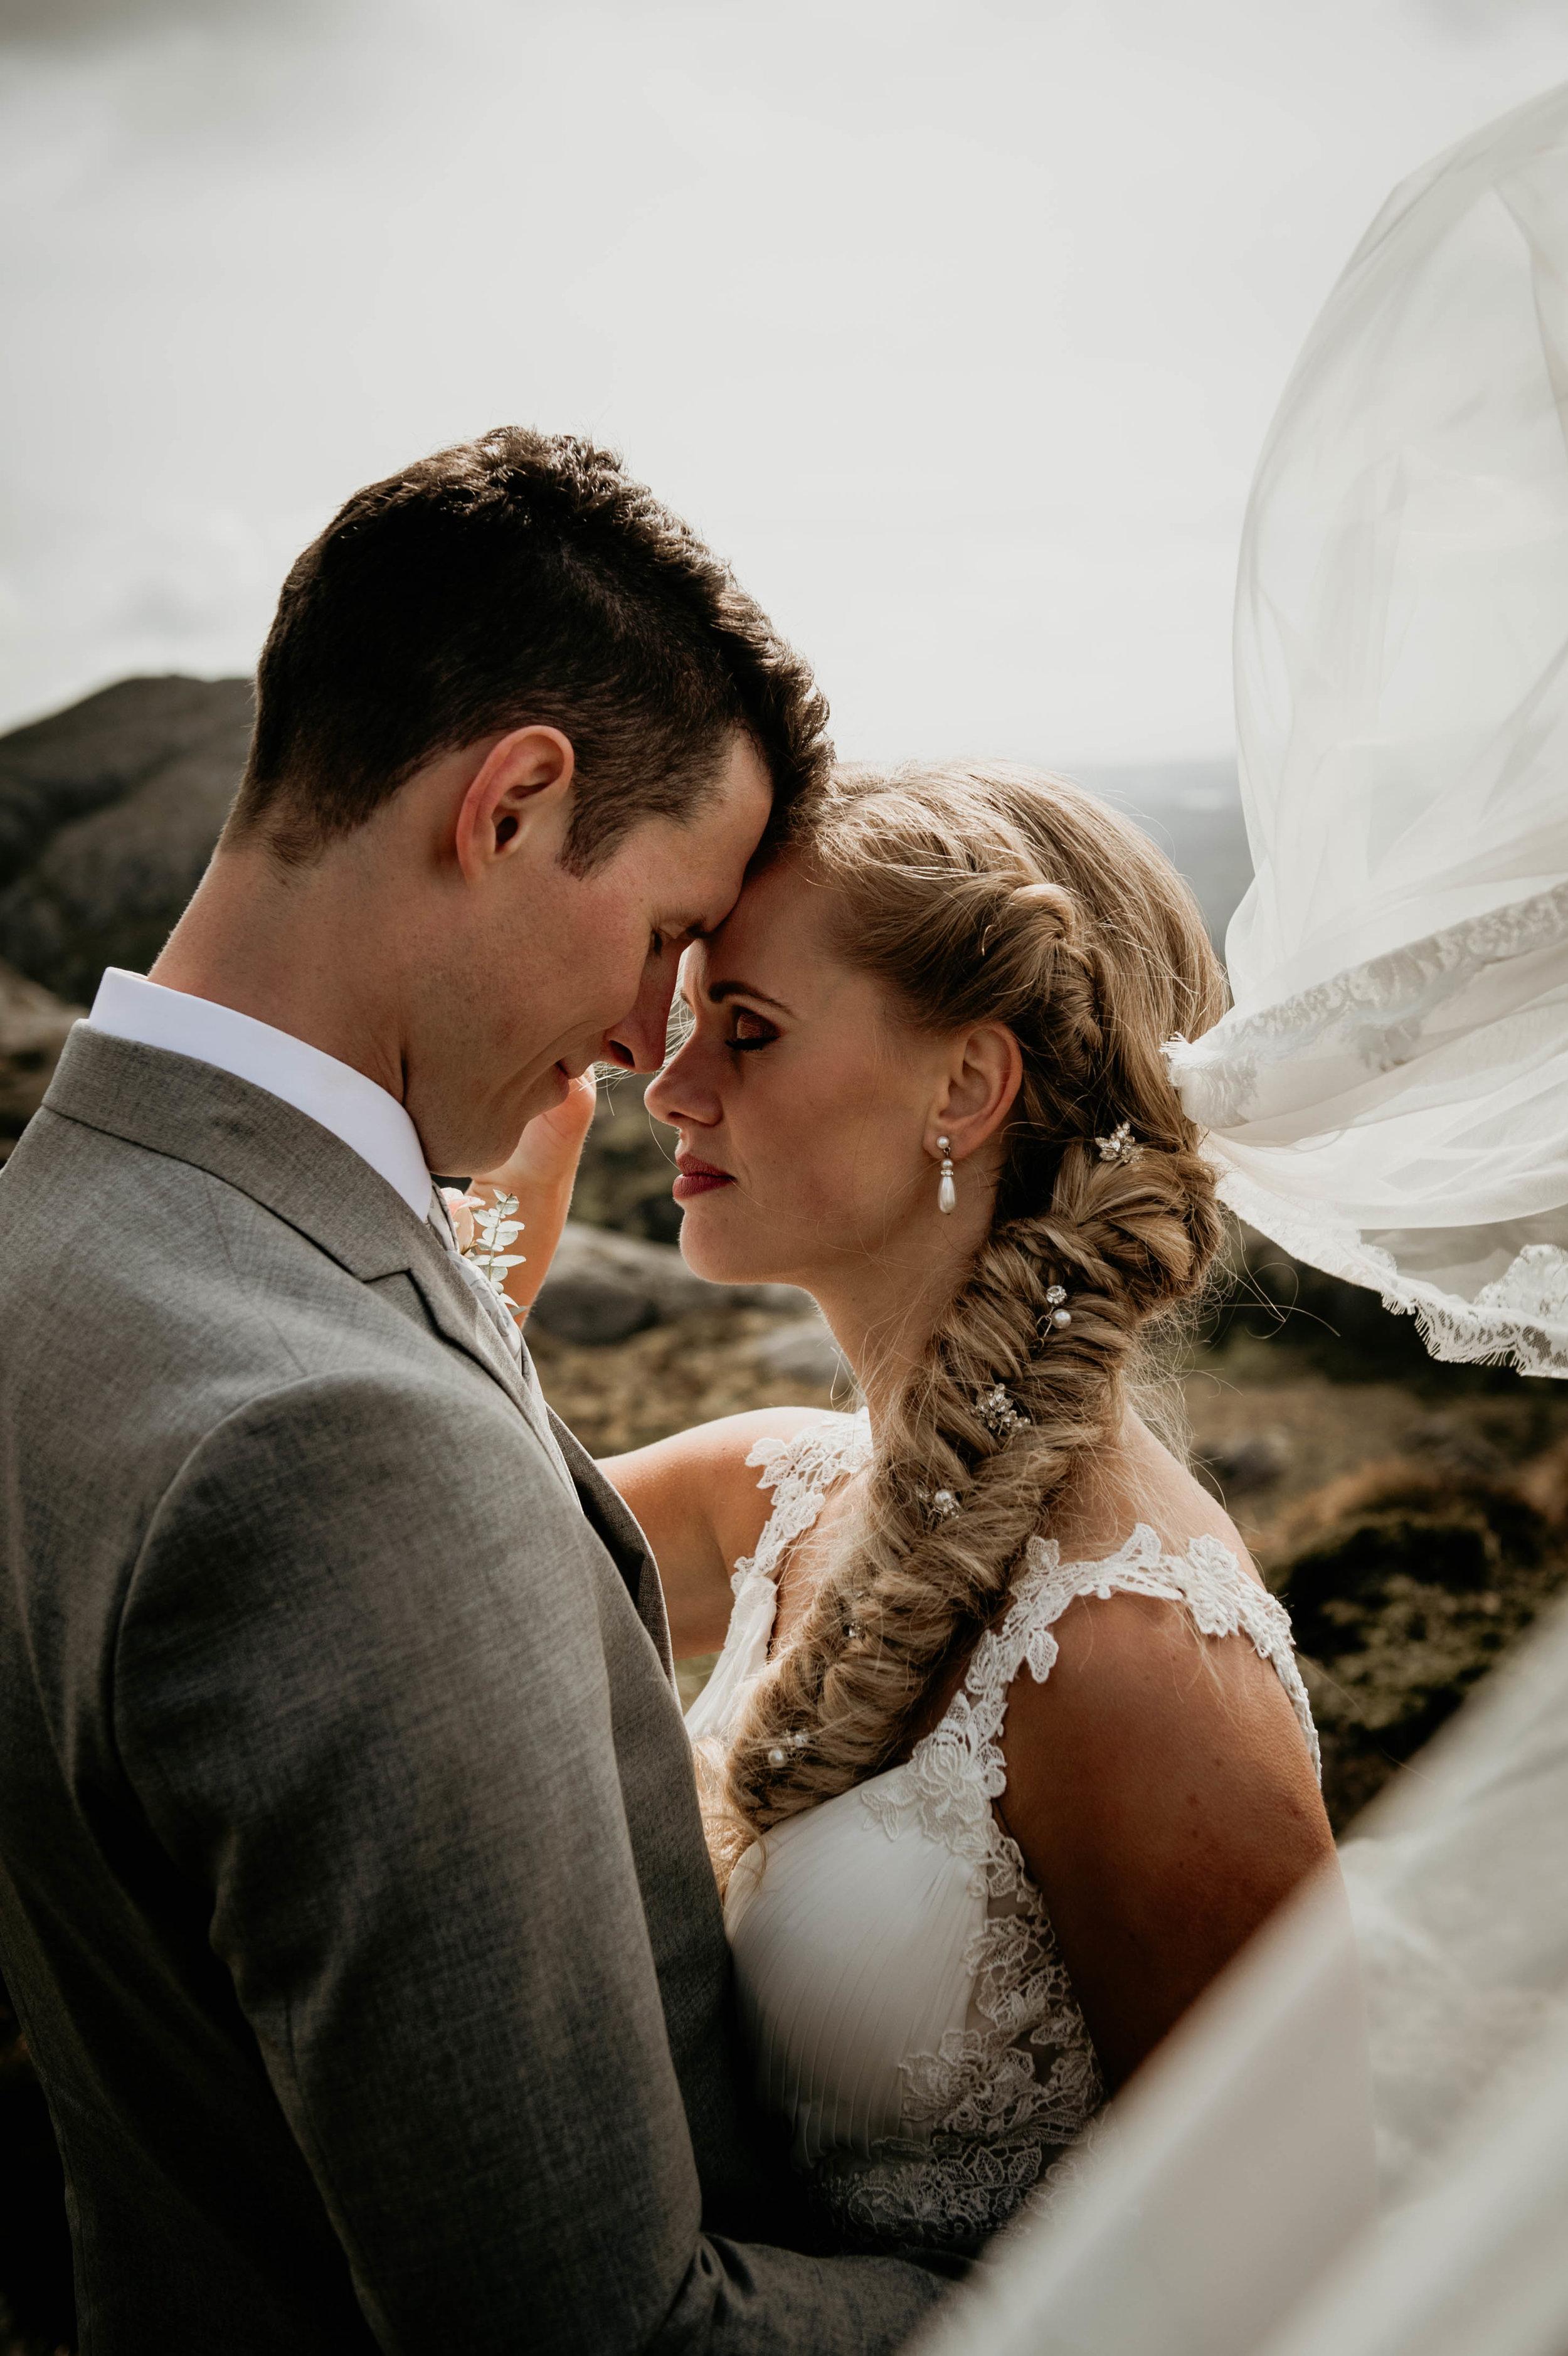 bryllupsfotograf.kristine.ristesund.jpg